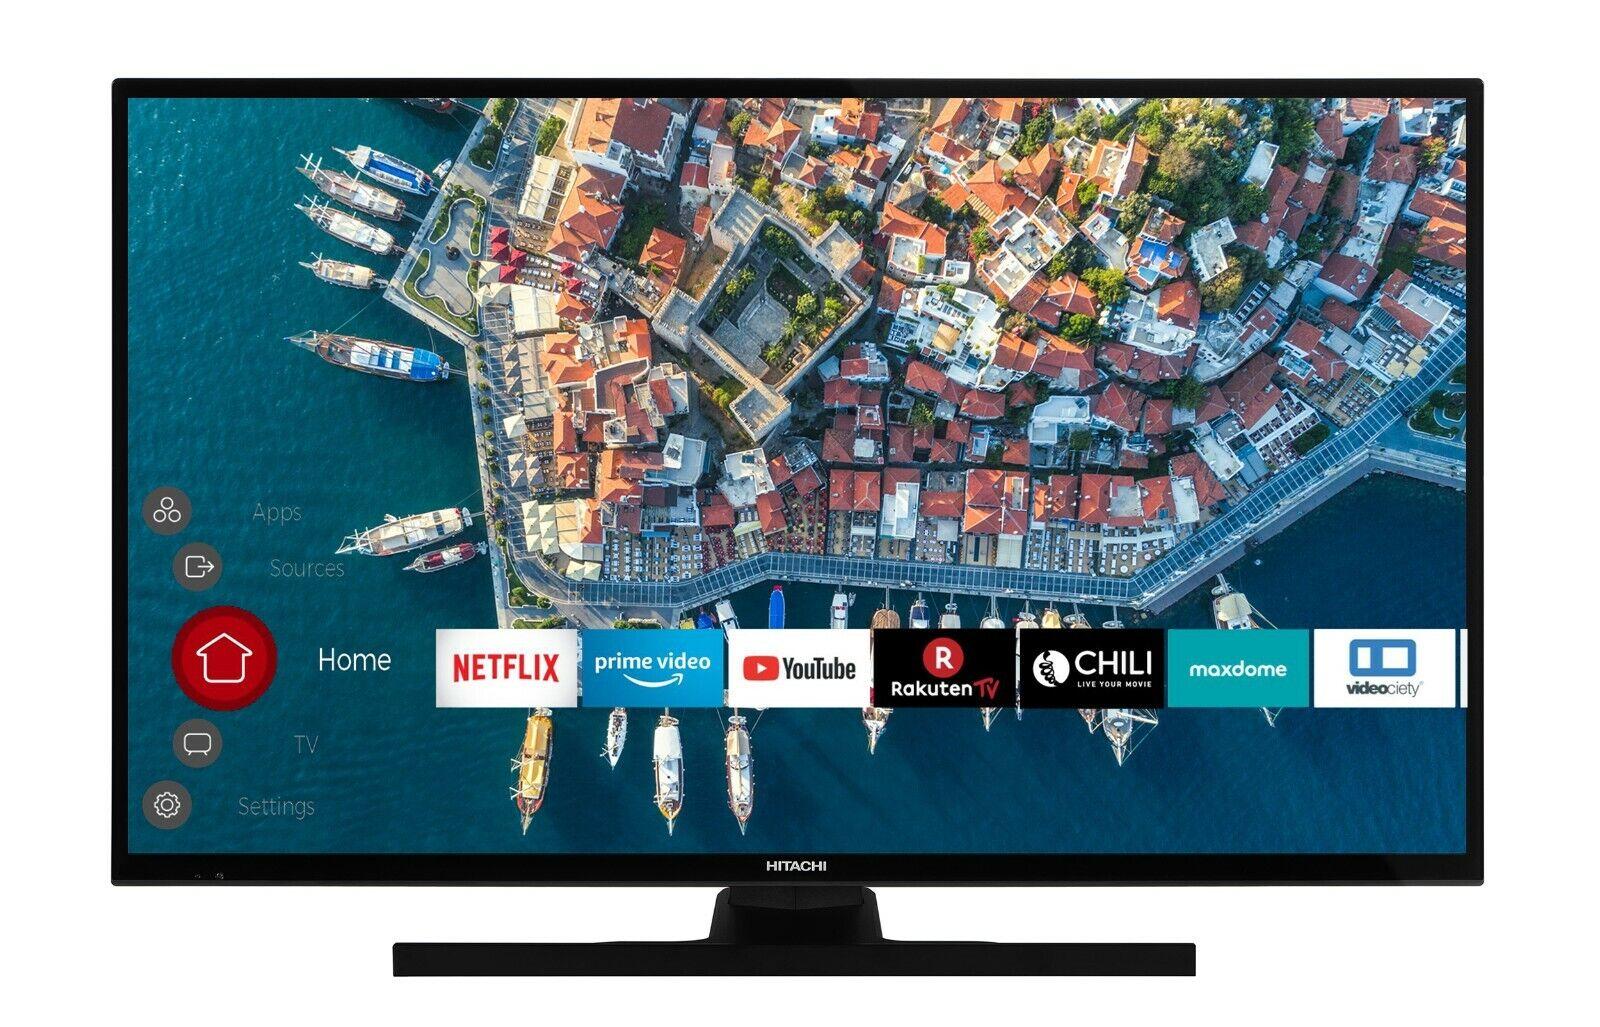 Hitachi F39E4100 Fernseher 39 Zoll Full HD Triple Tuner Smart TV PVR Bluetooth